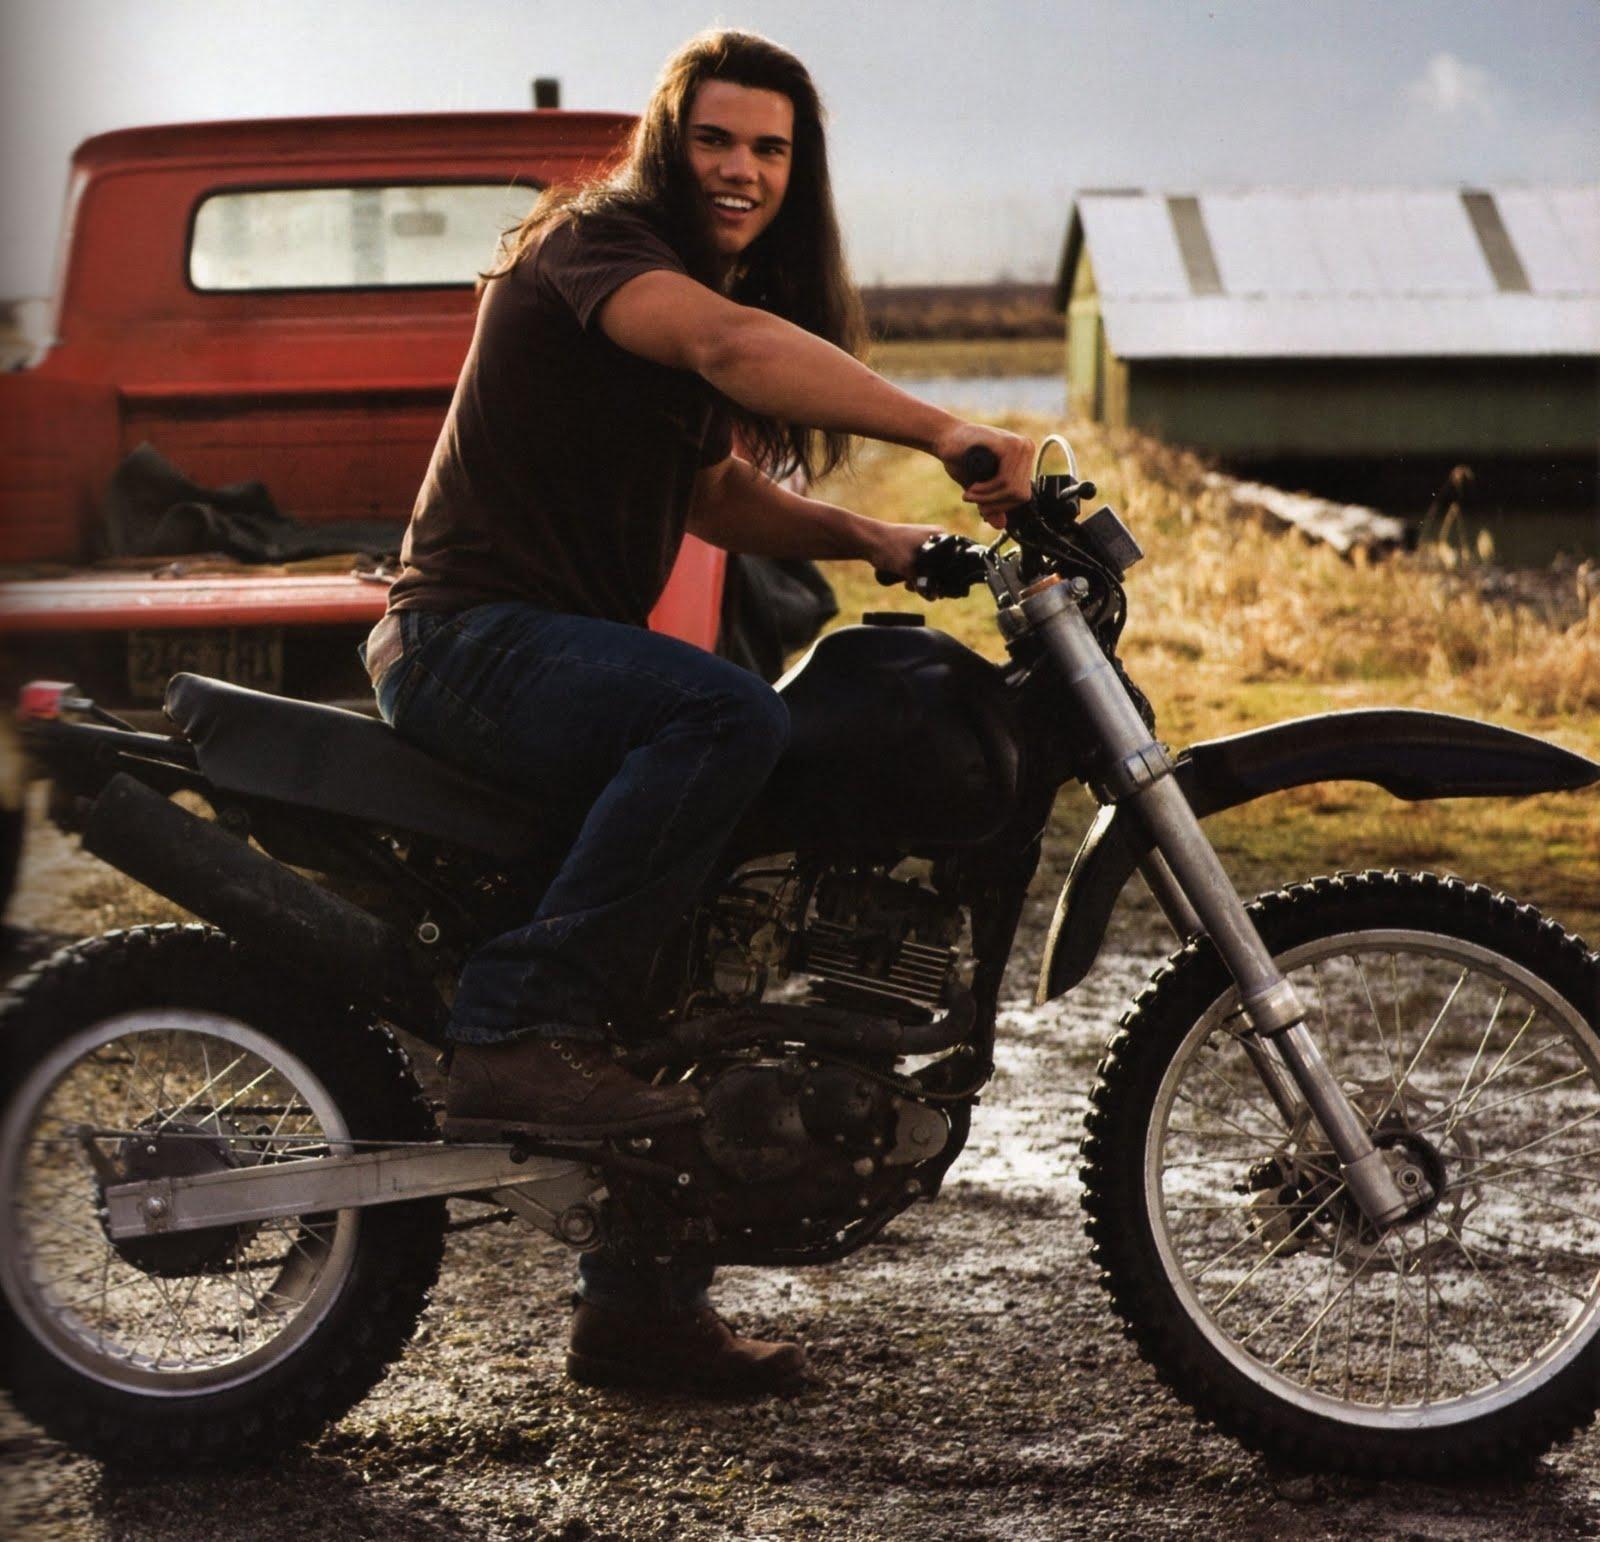 http://2.bp.blogspot.com/_yhfIMNFyTzg/TC3mry1HR8I/AAAAAAAACGQ/hoy6HlgnVfw/s1600/8-jacob-motorcycle.jpg